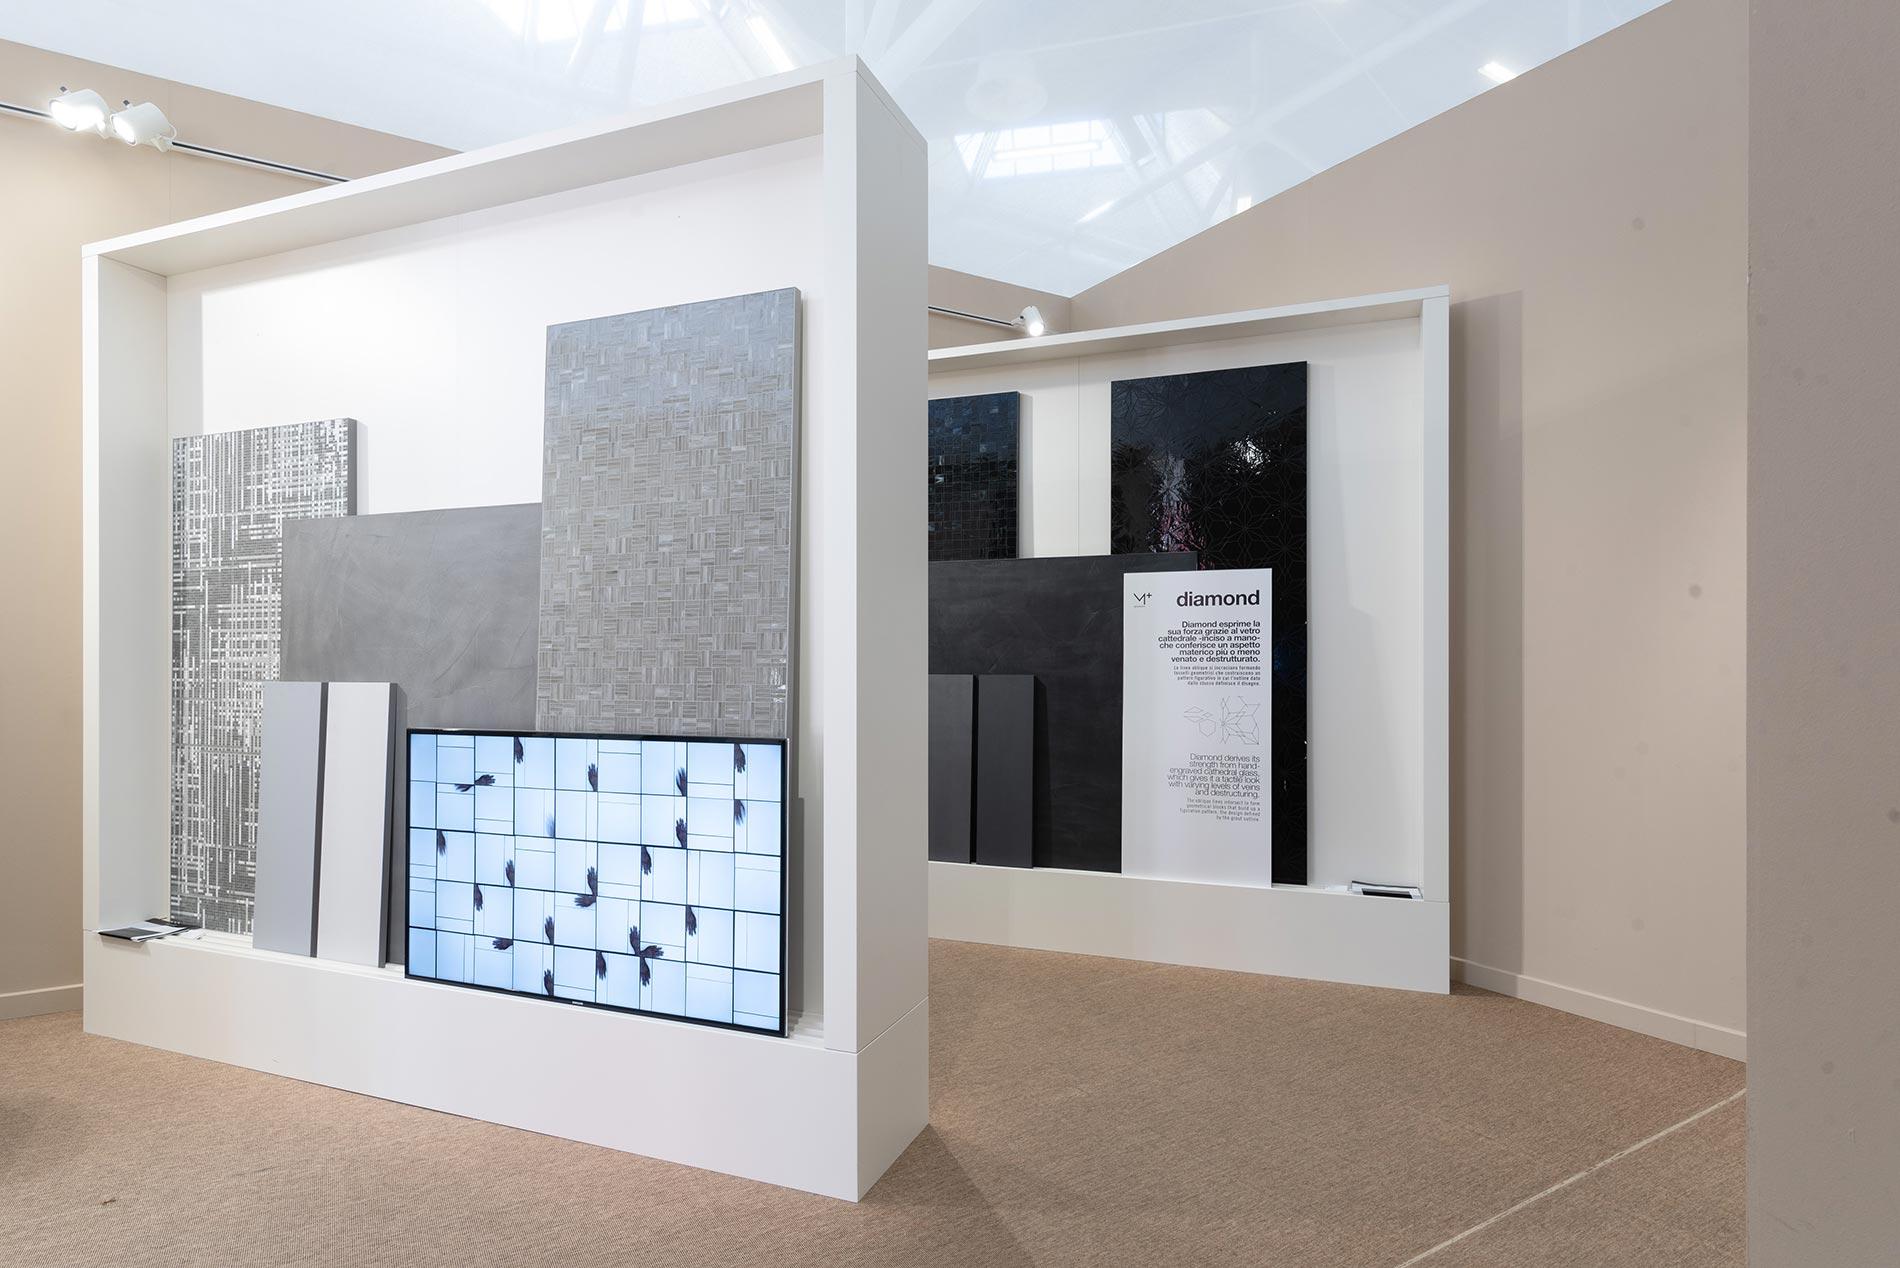 ADI Ceramic and bathroom design award 2018